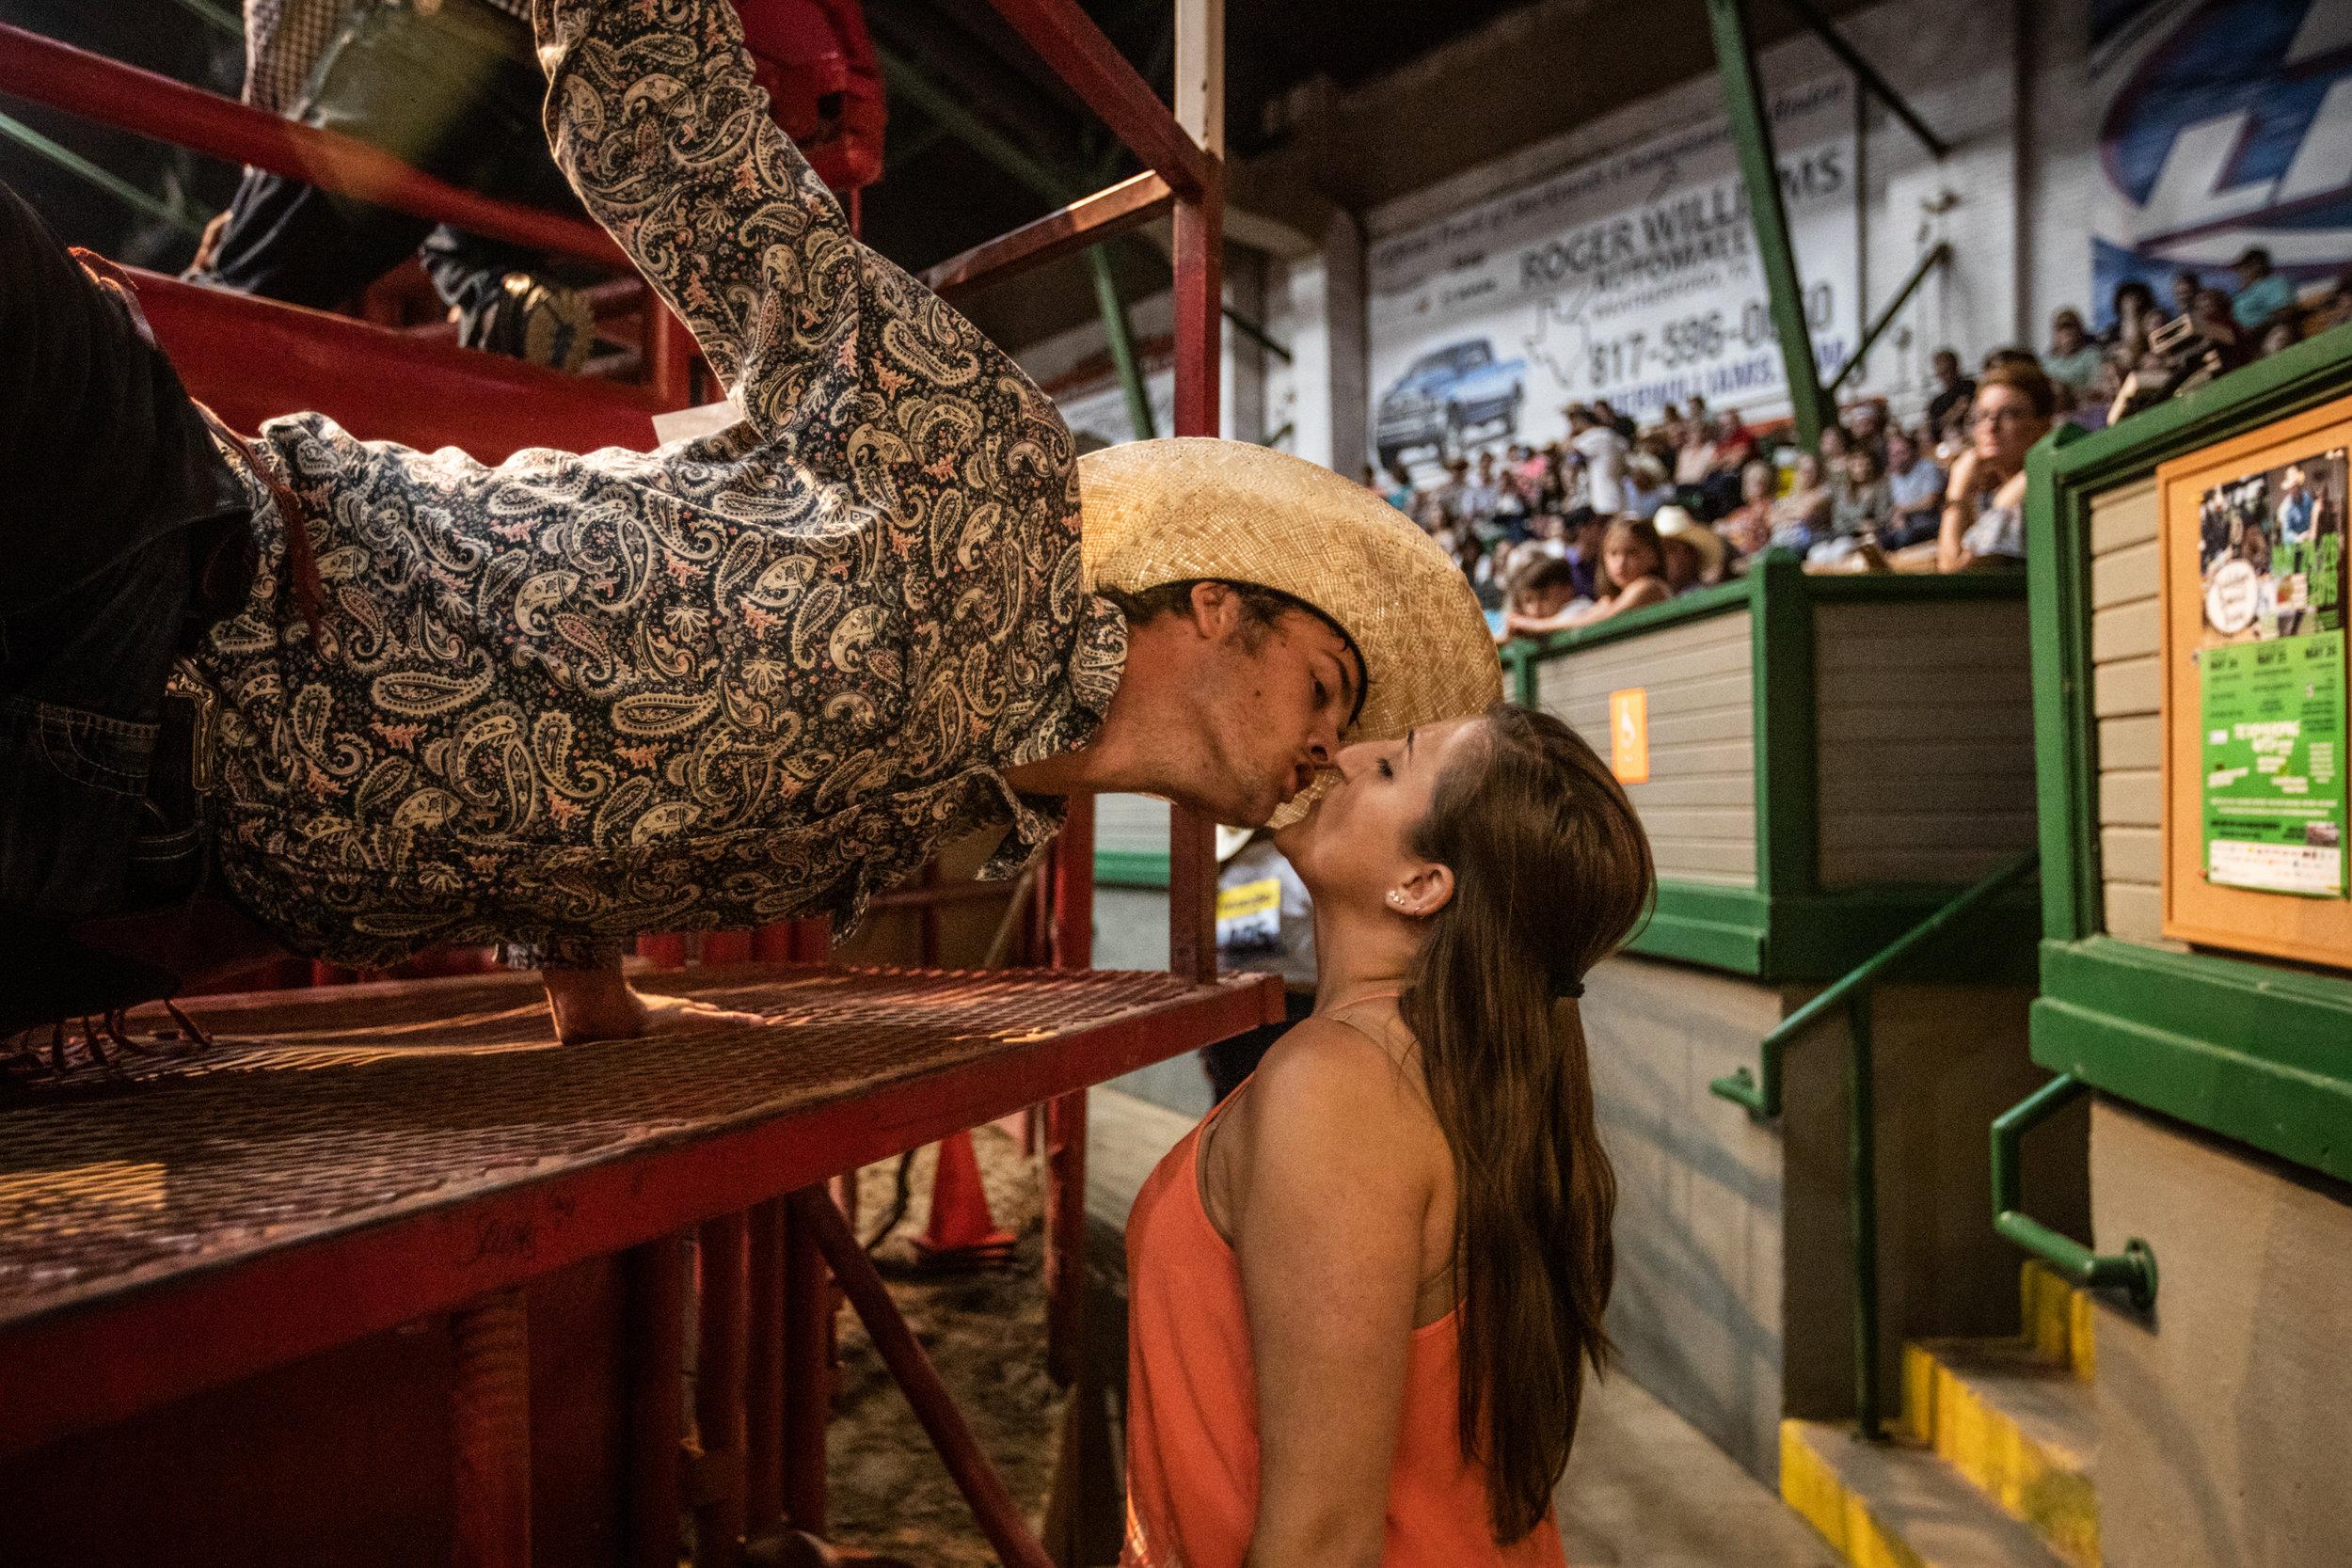 Fort Worth Stockyards Rodeo